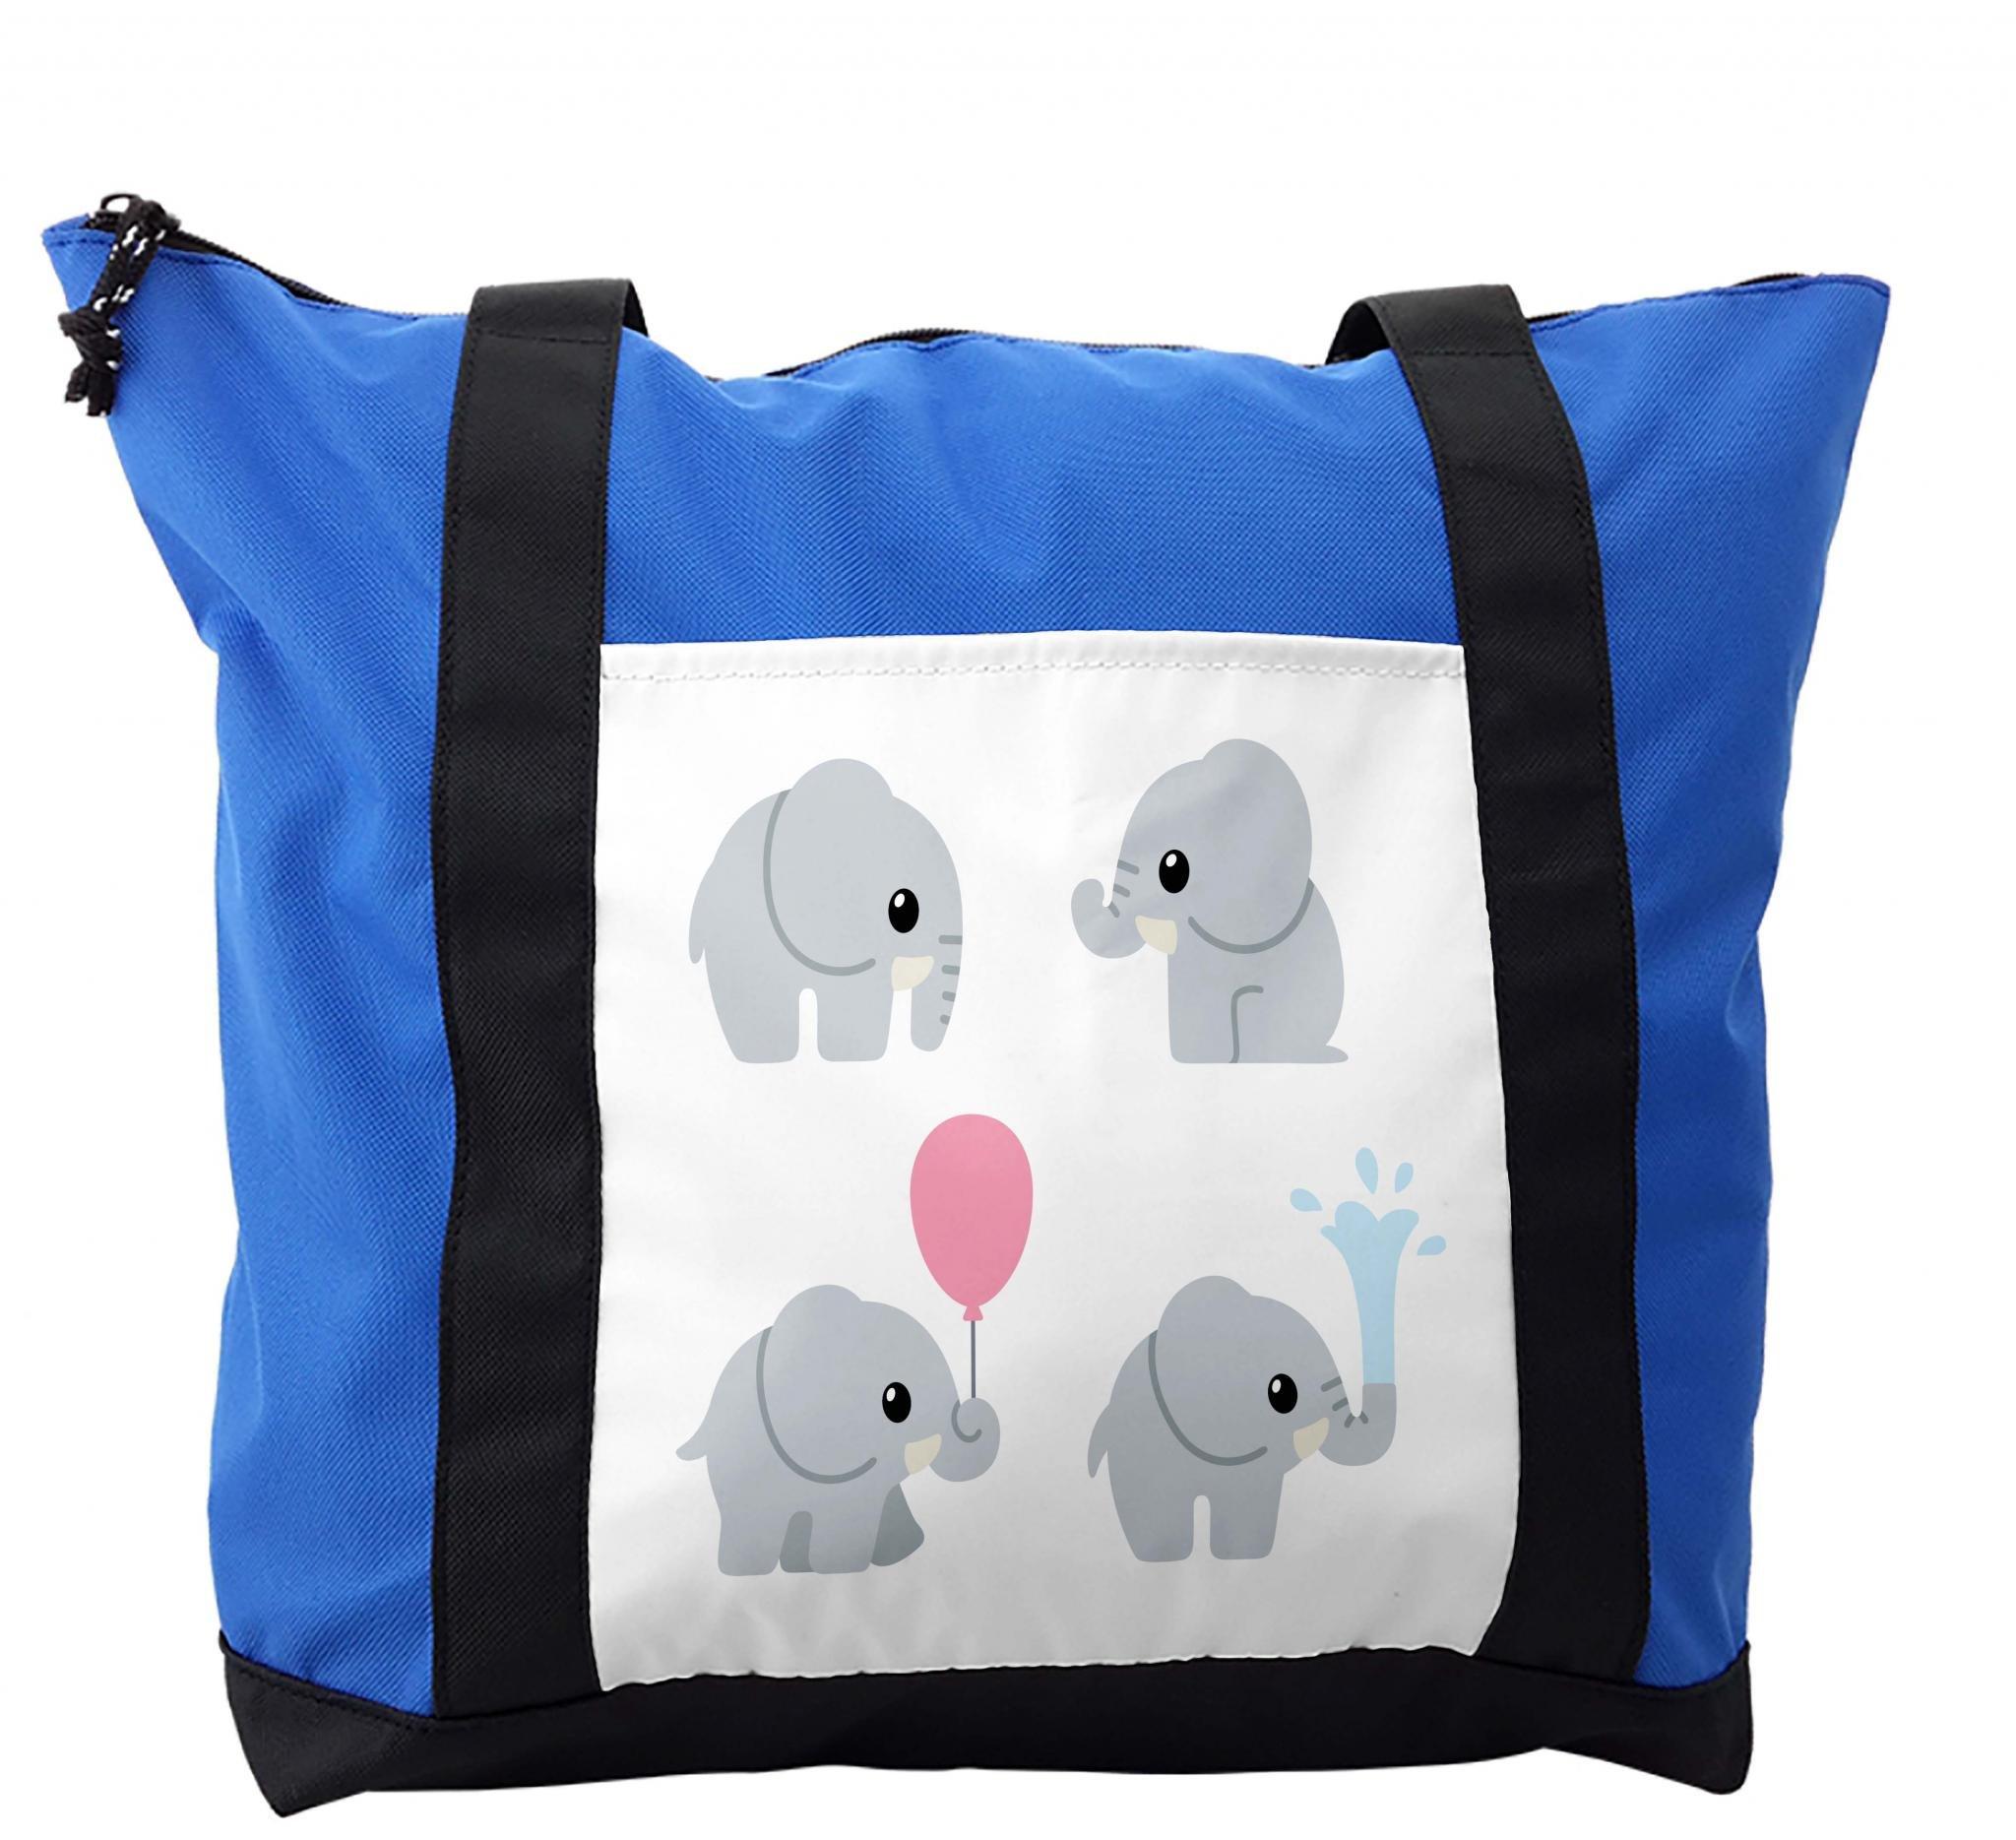 Lunarable Baby Shower Shoulder Bag, Cute Elephants Balloon, Durable with Zipper